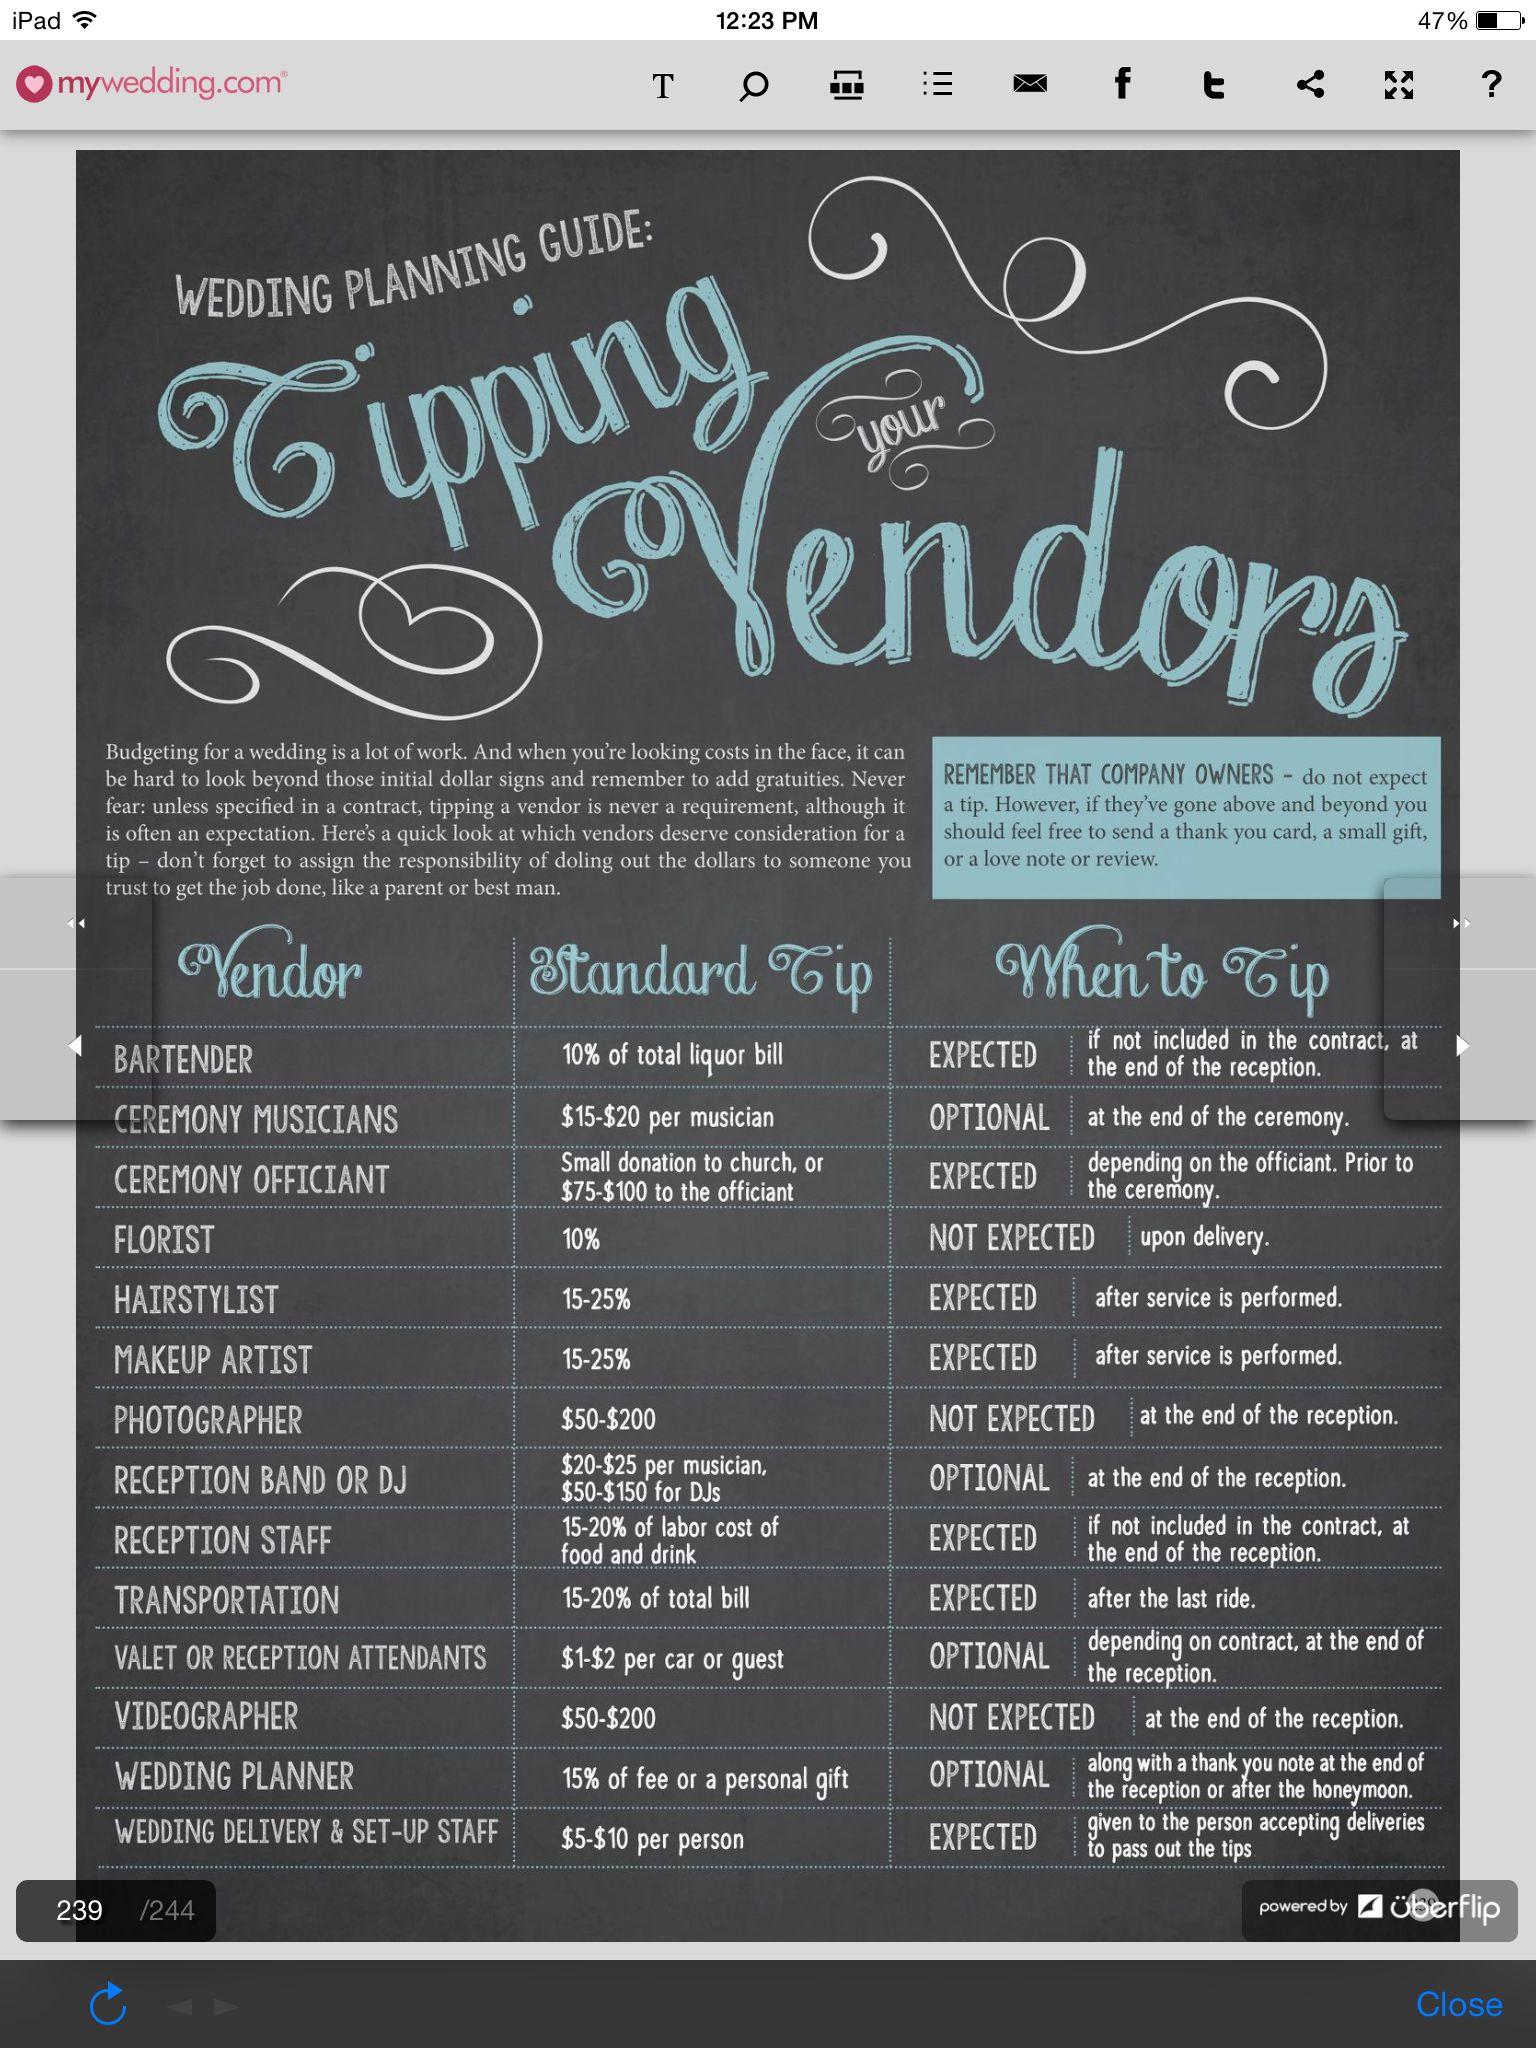 Pin By Melissa Osborne On Weddings Wedding Planning Guide Wedding Planning Wedding Vendors